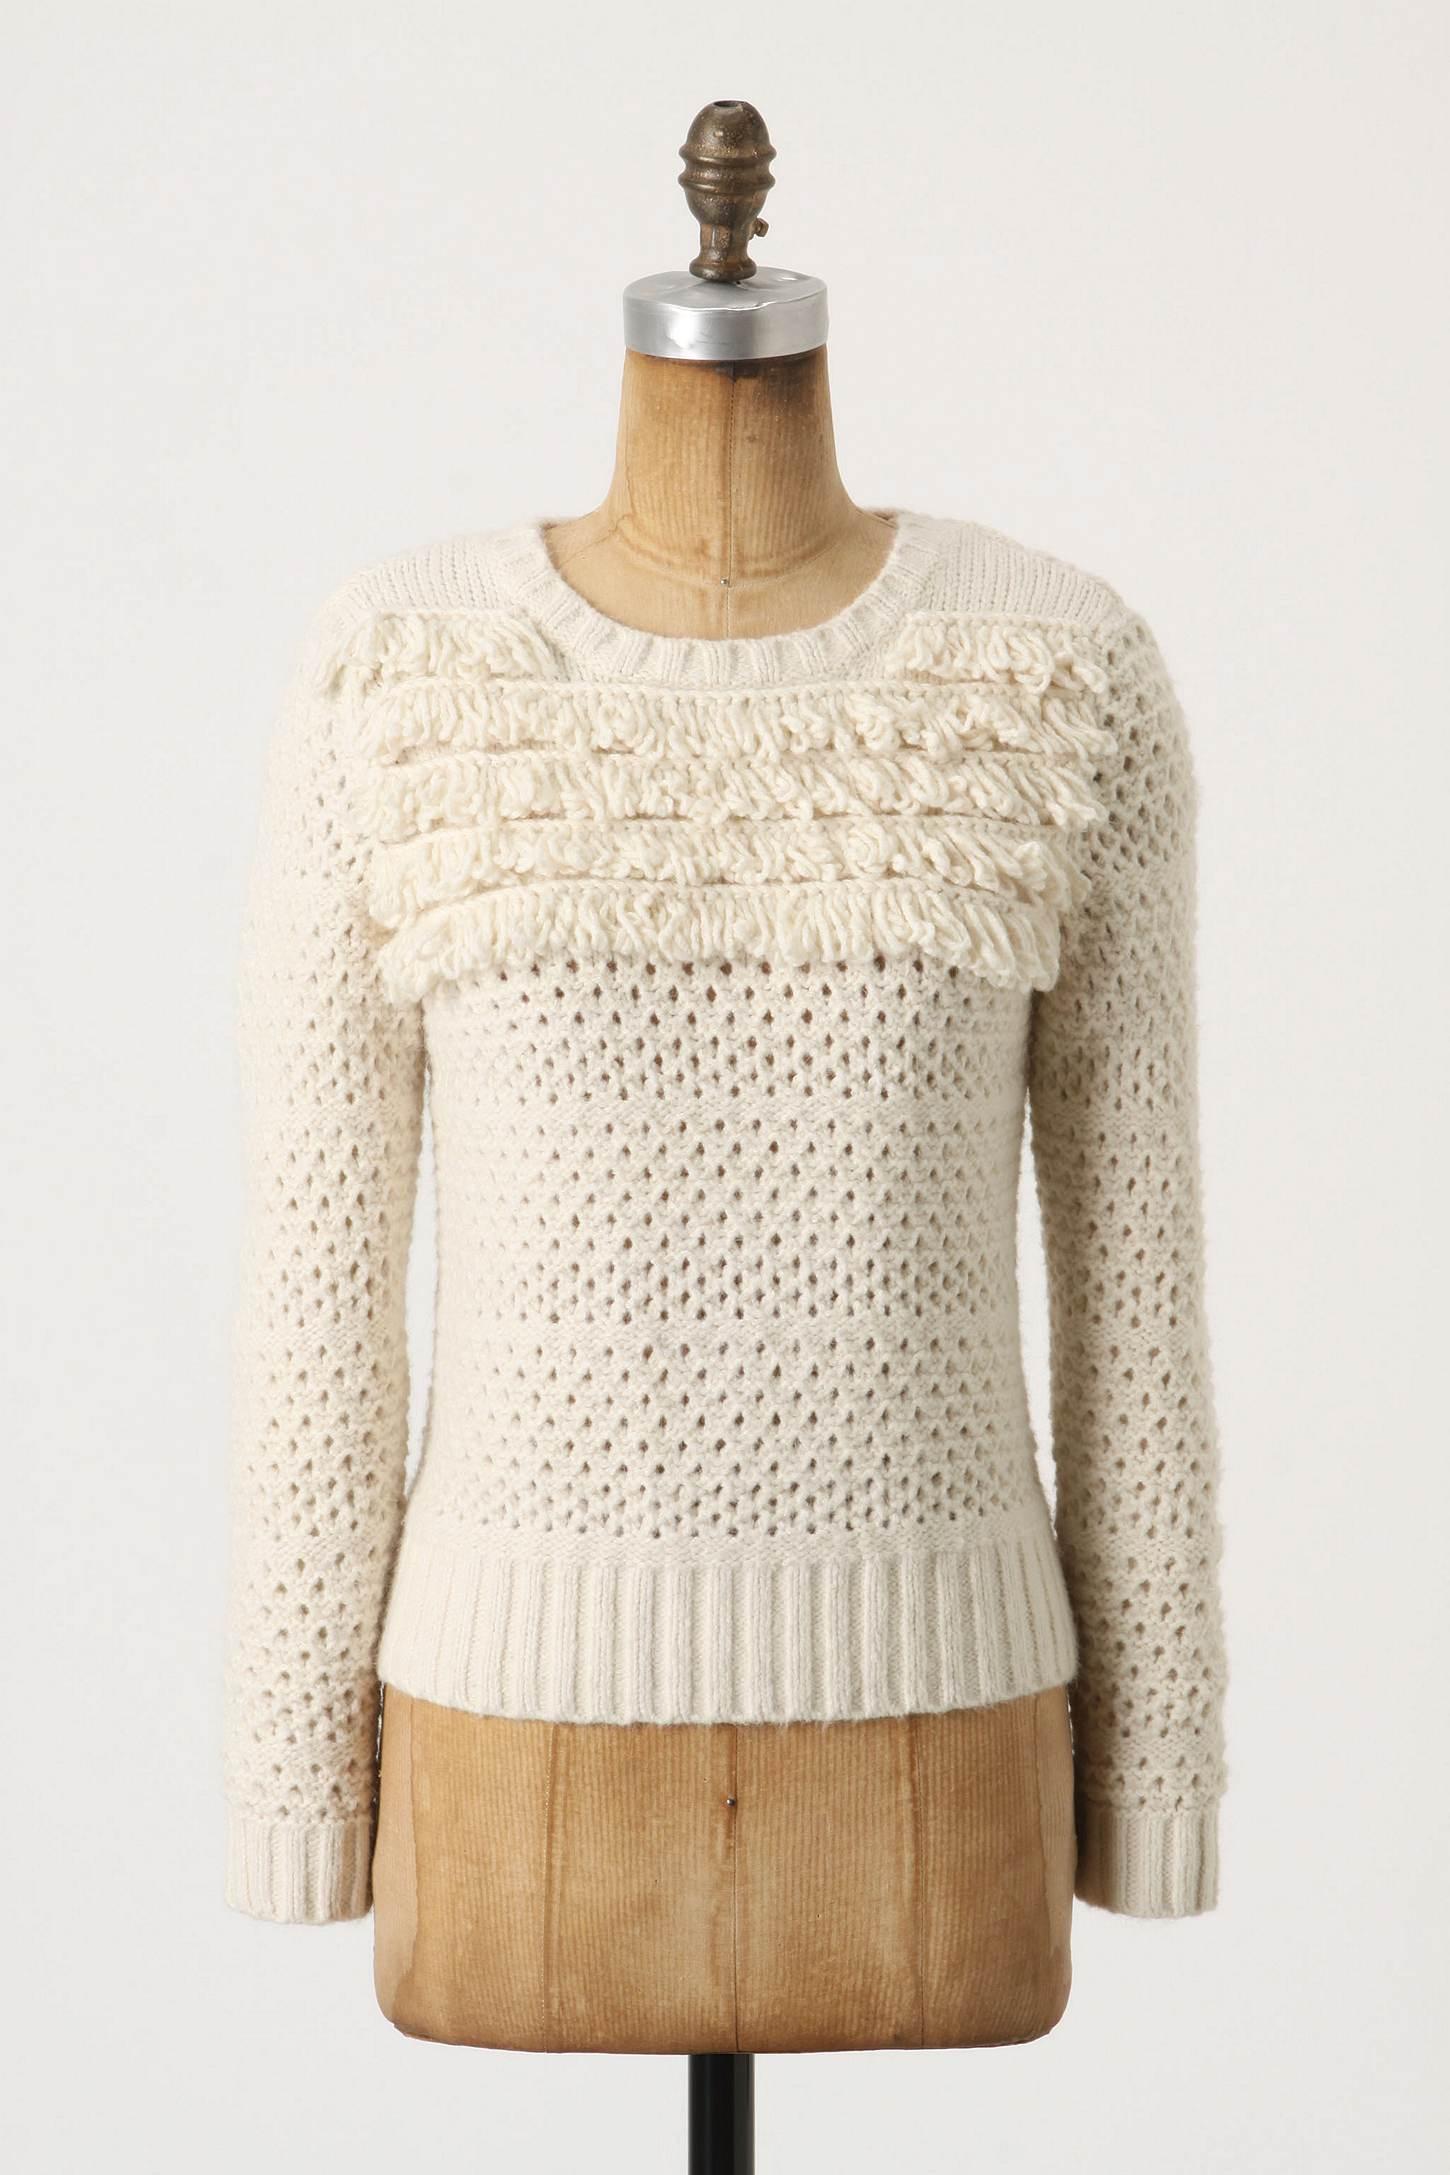 Tacky Christmas Sweater | Walmart Ugly Sweater | Shaggy Sweater